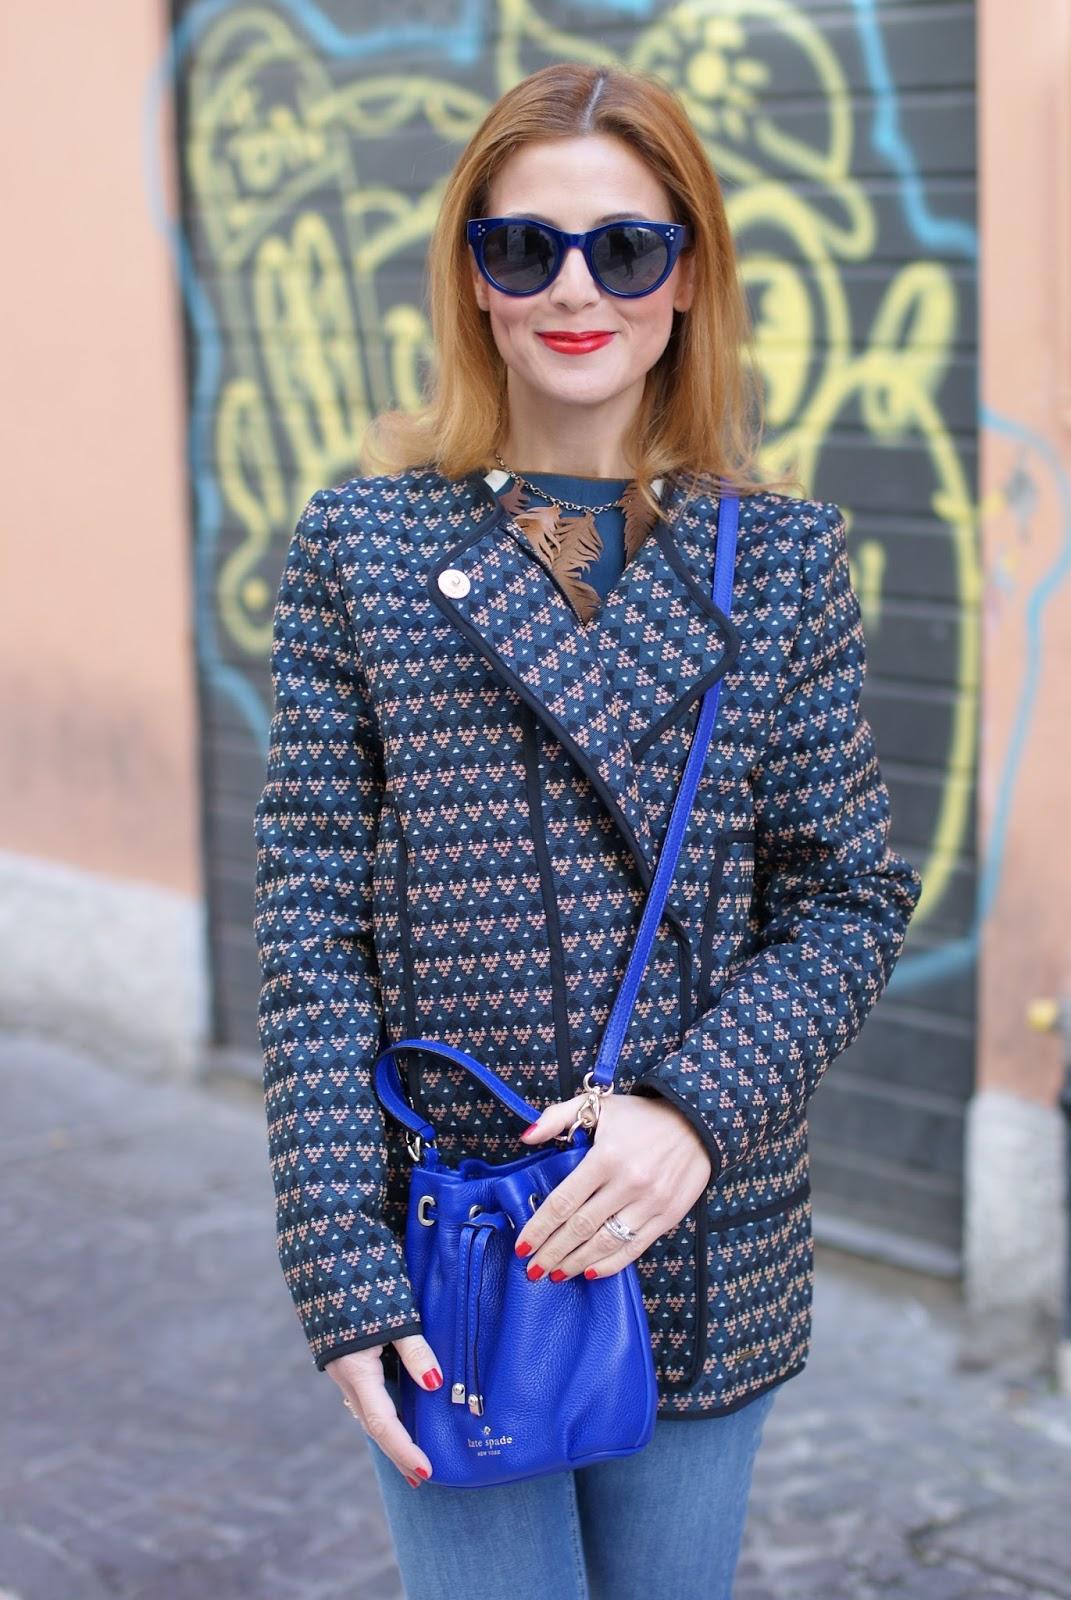 Kate Spade Wyatt mini bucket bag and Paramita jacket on Fashion and Cookies fashion blog, fashion blogger style